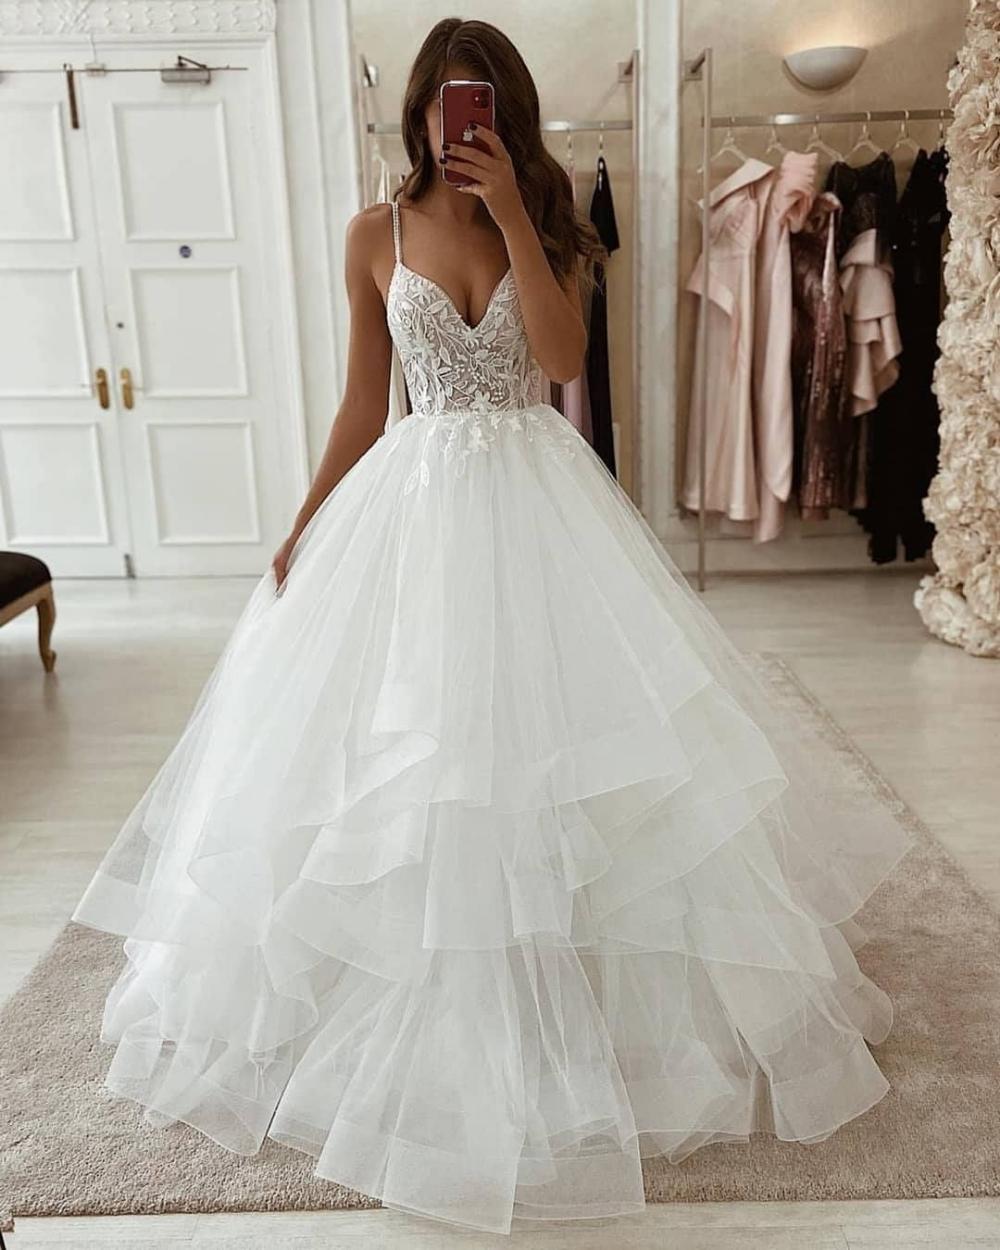 Wedding Dresses Short Sleeve Bridesmaid Dresses Near Me Best Celebrity In 2020 Ball Gowns Wedding Dream Wedding Dresses Cute Wedding Dress